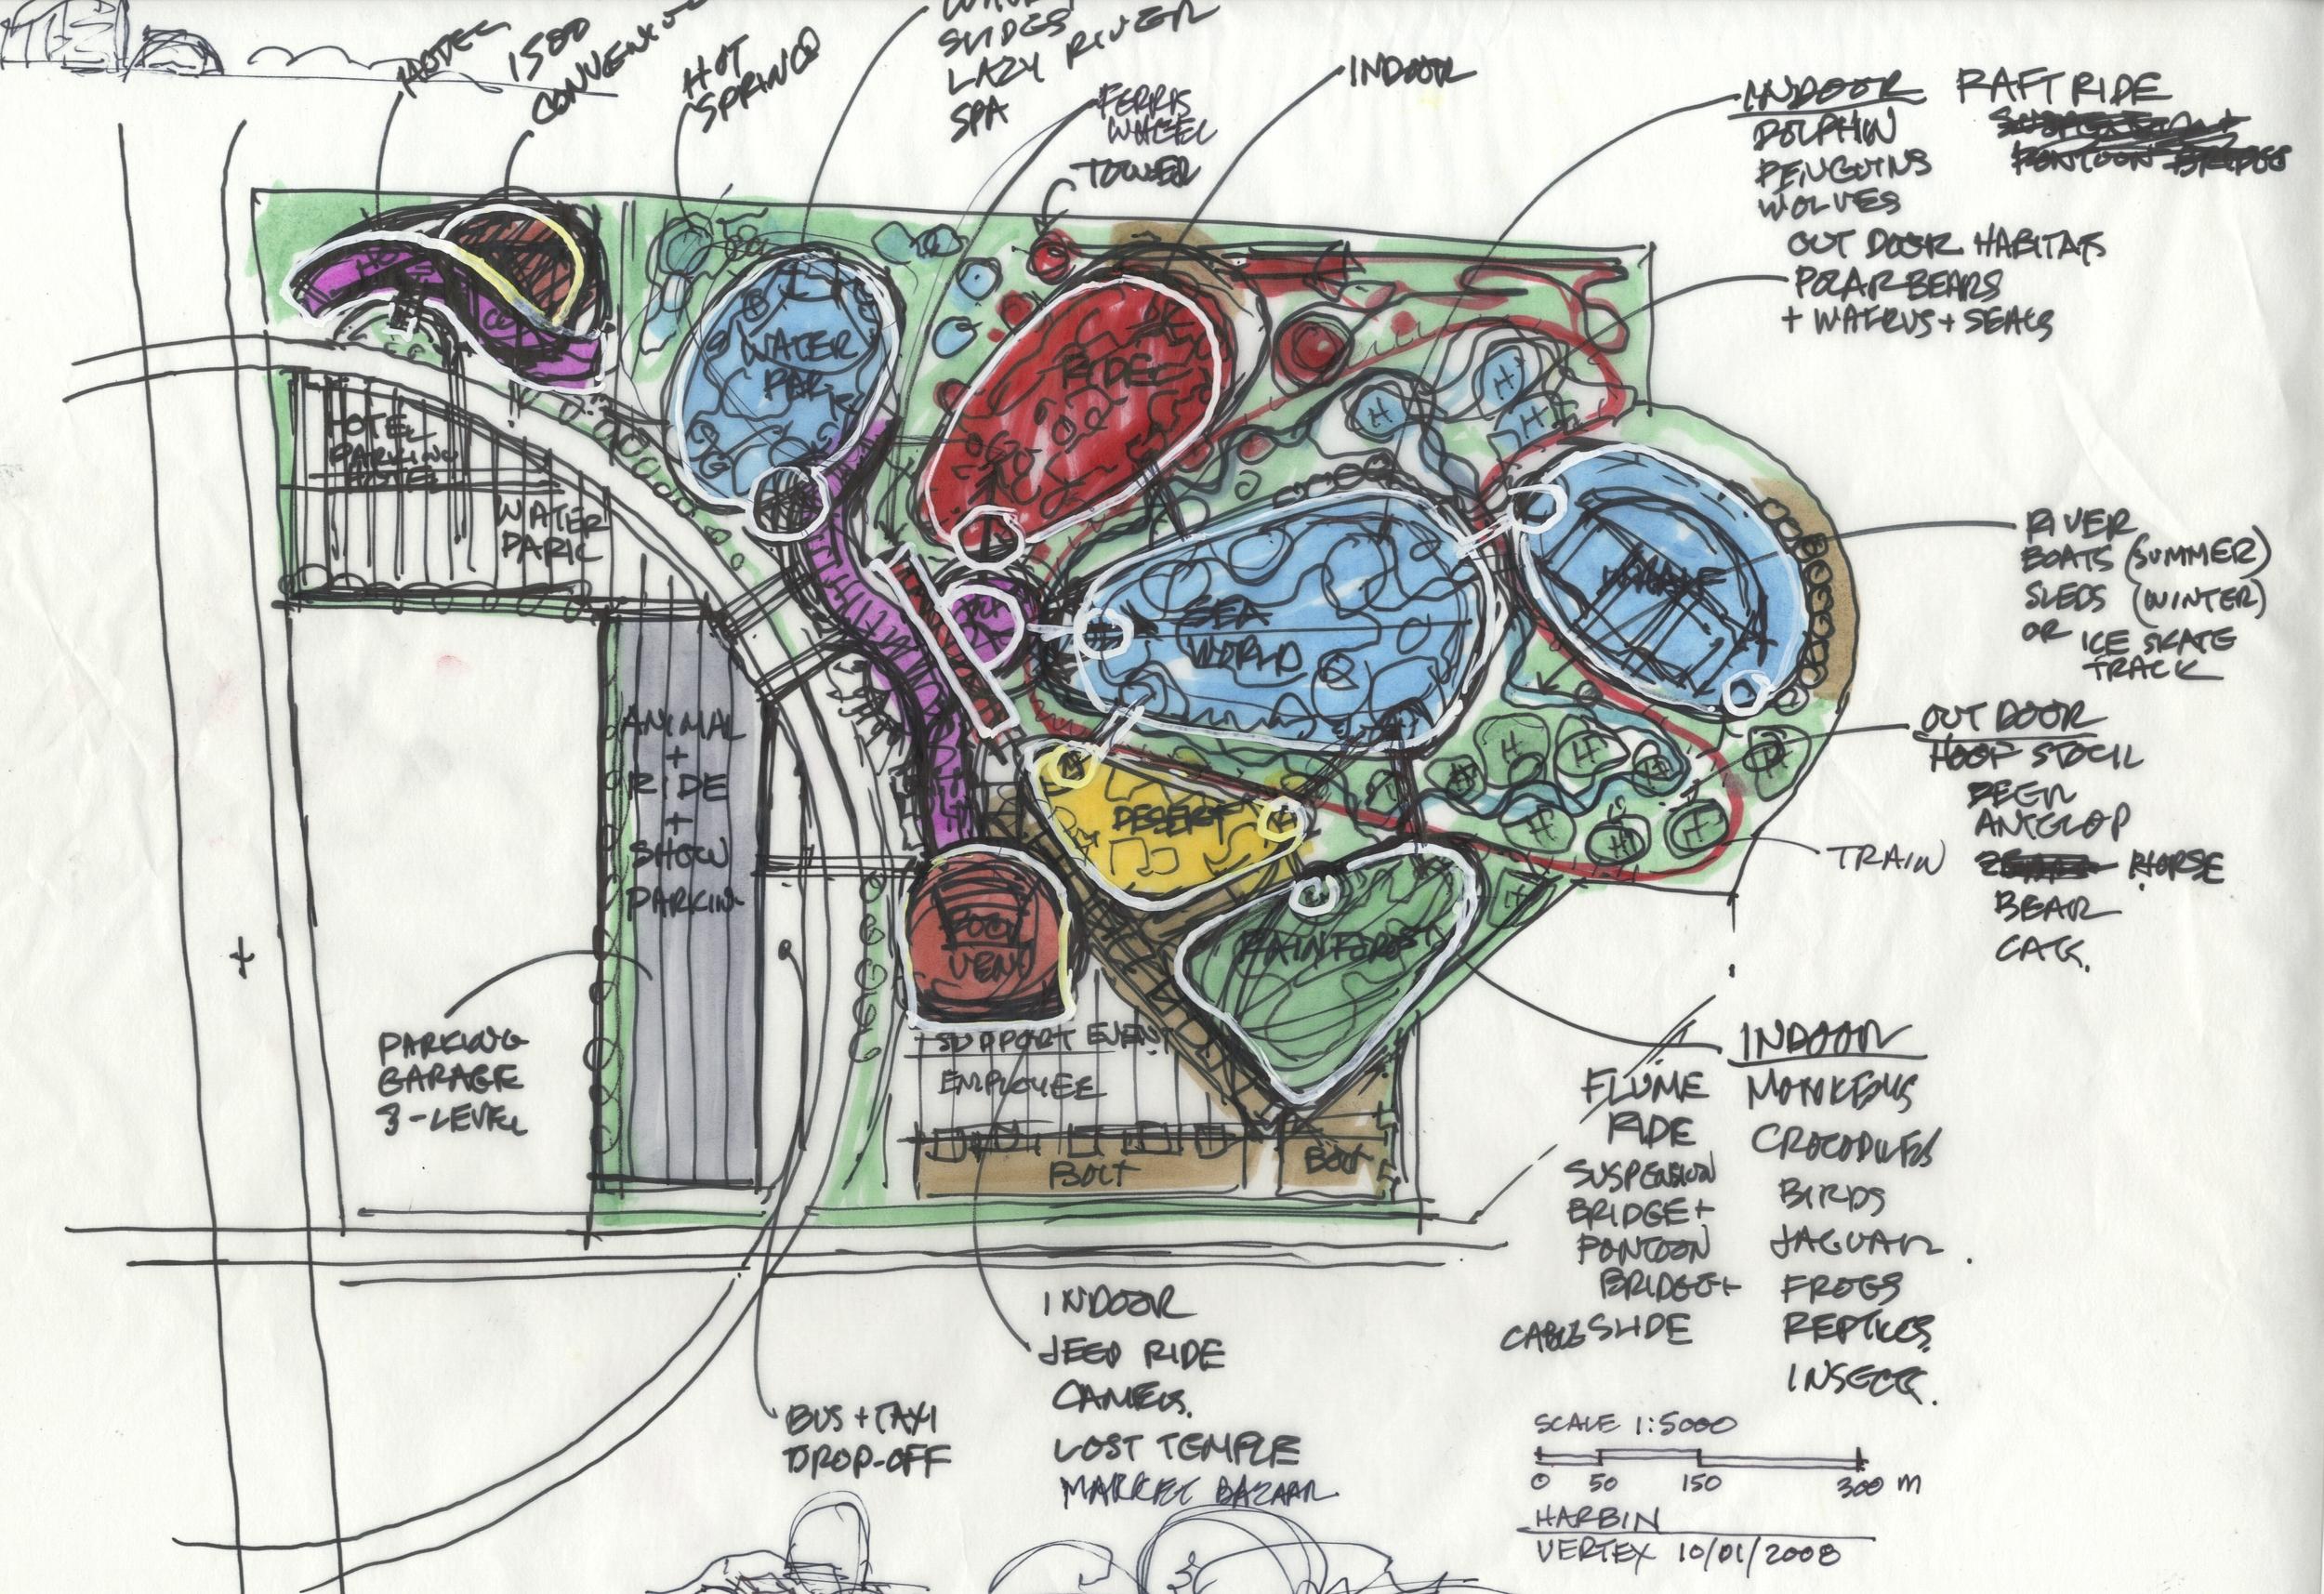 concept layout 01Oct2008.jpg